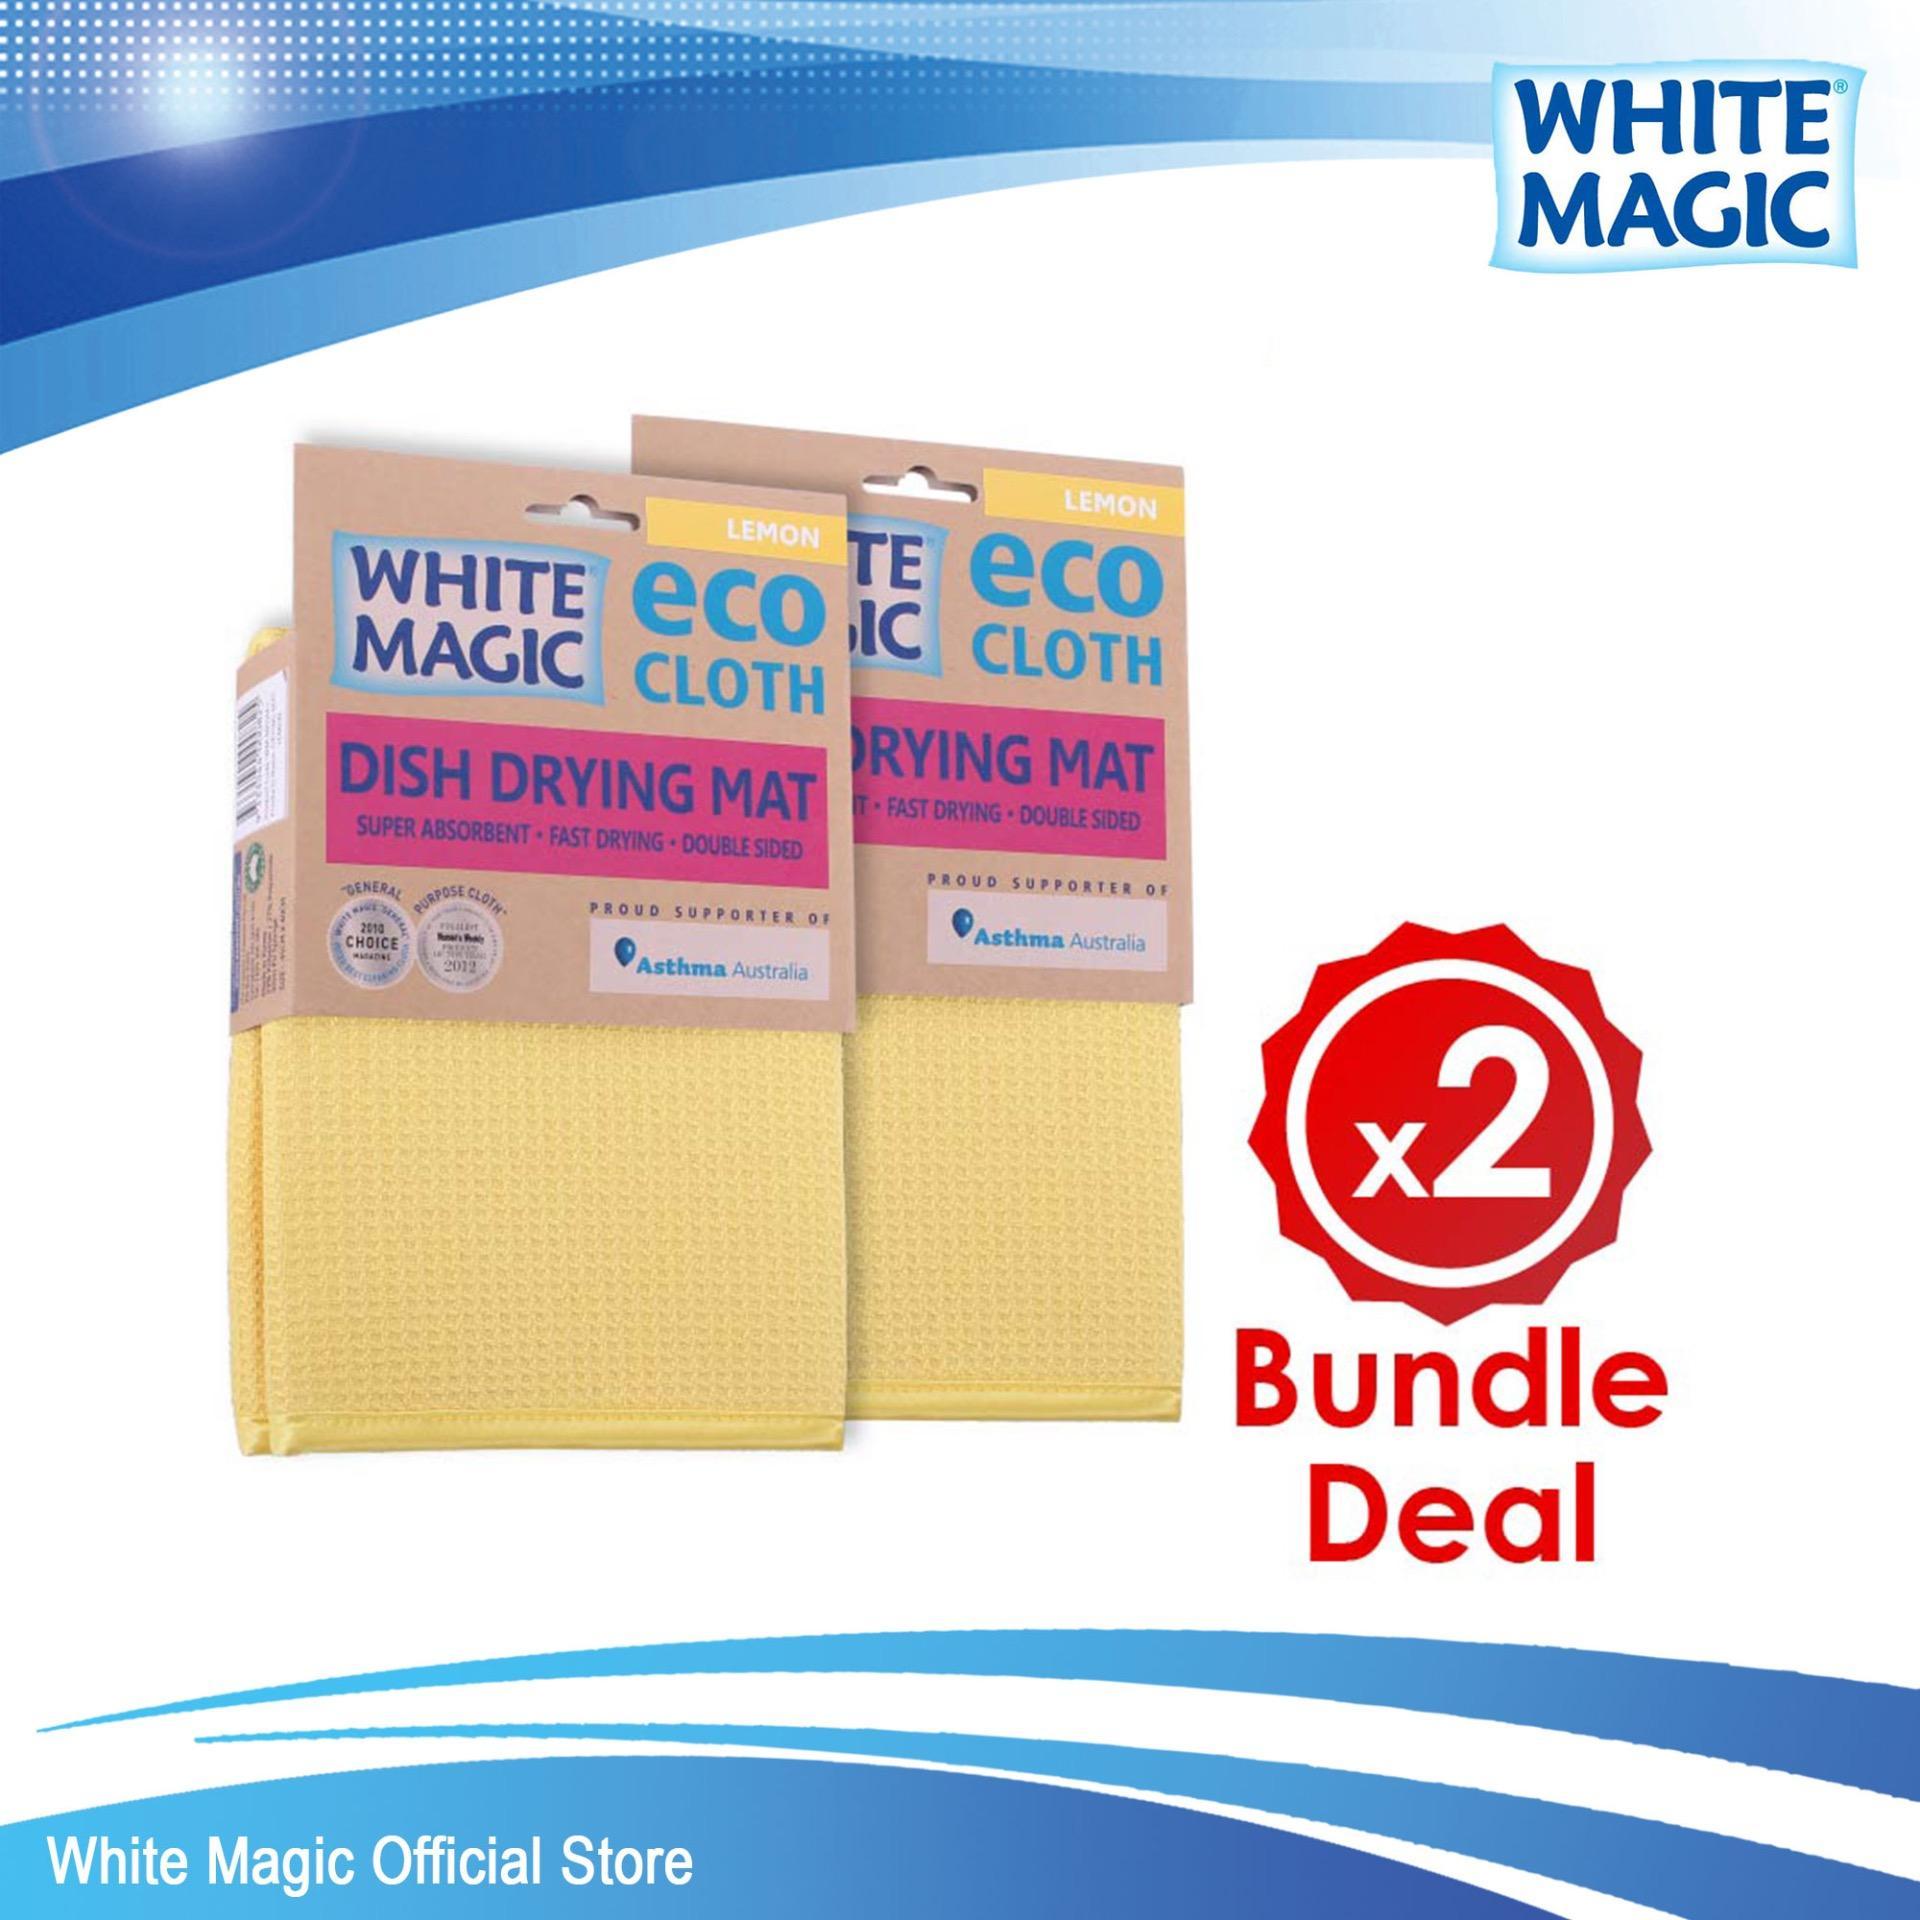 Review Bundle Deal White Magic Dish Drying Mat X 2 White Magic